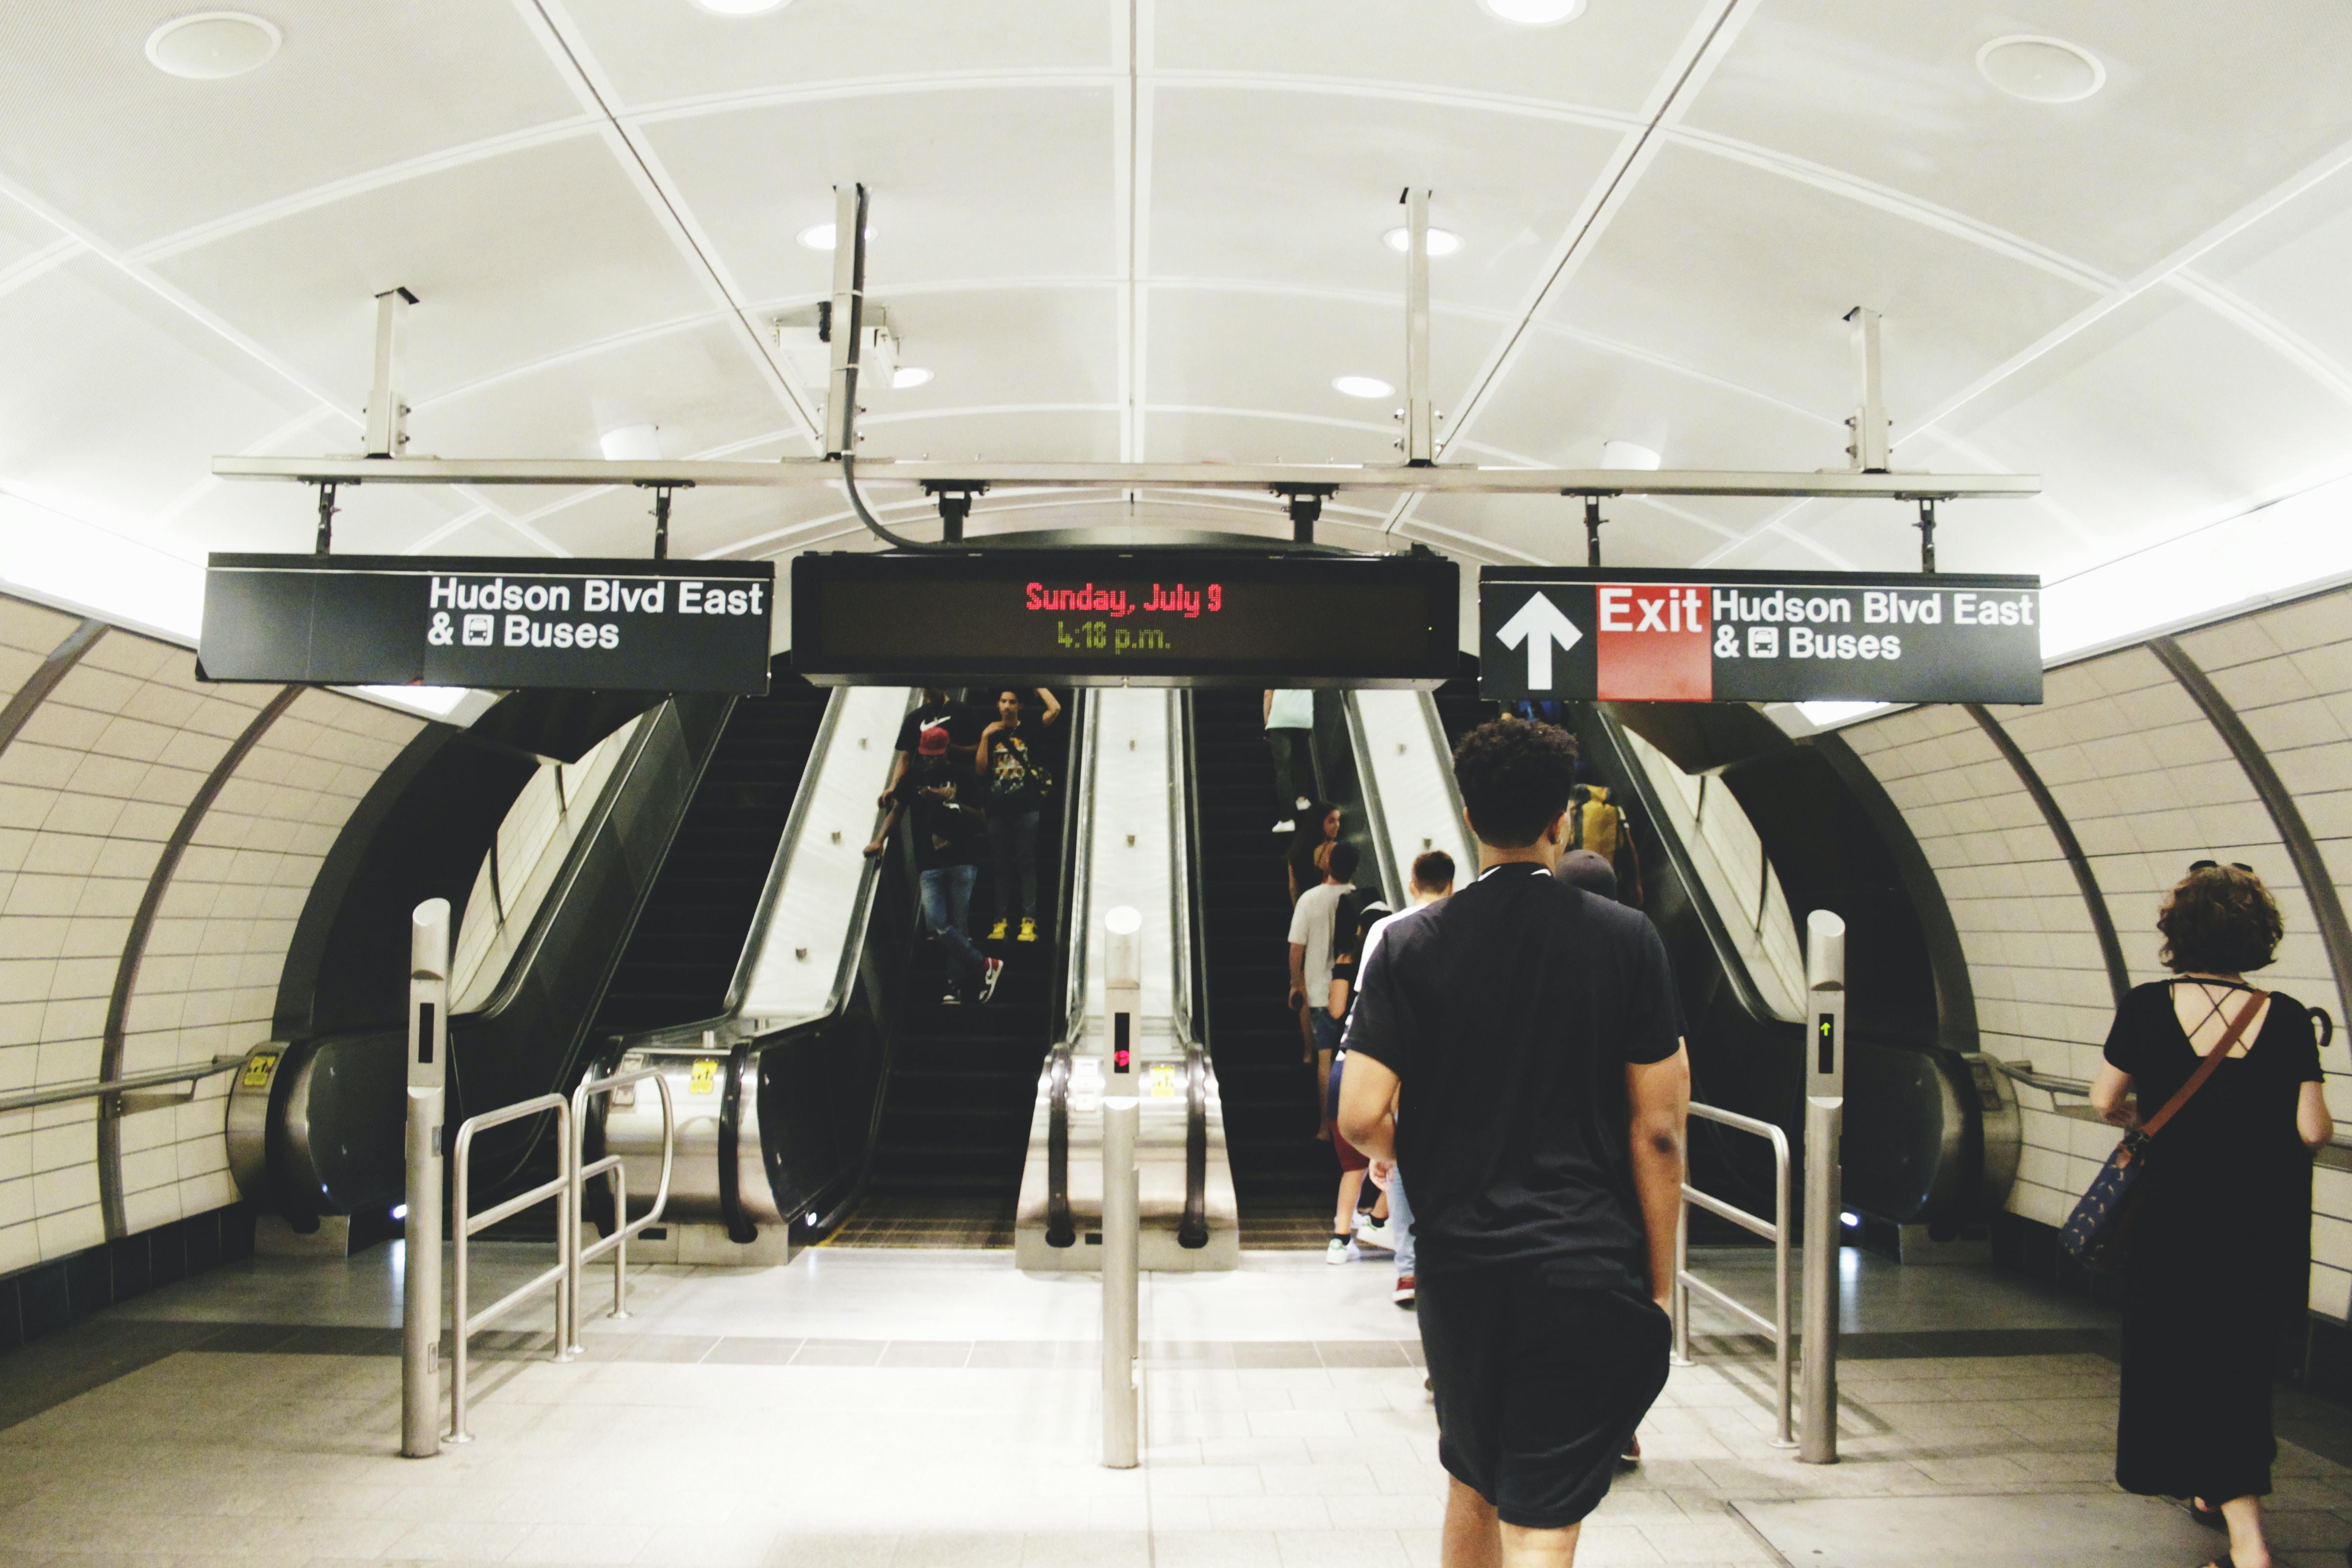 people walking towards escalator inside Bus station